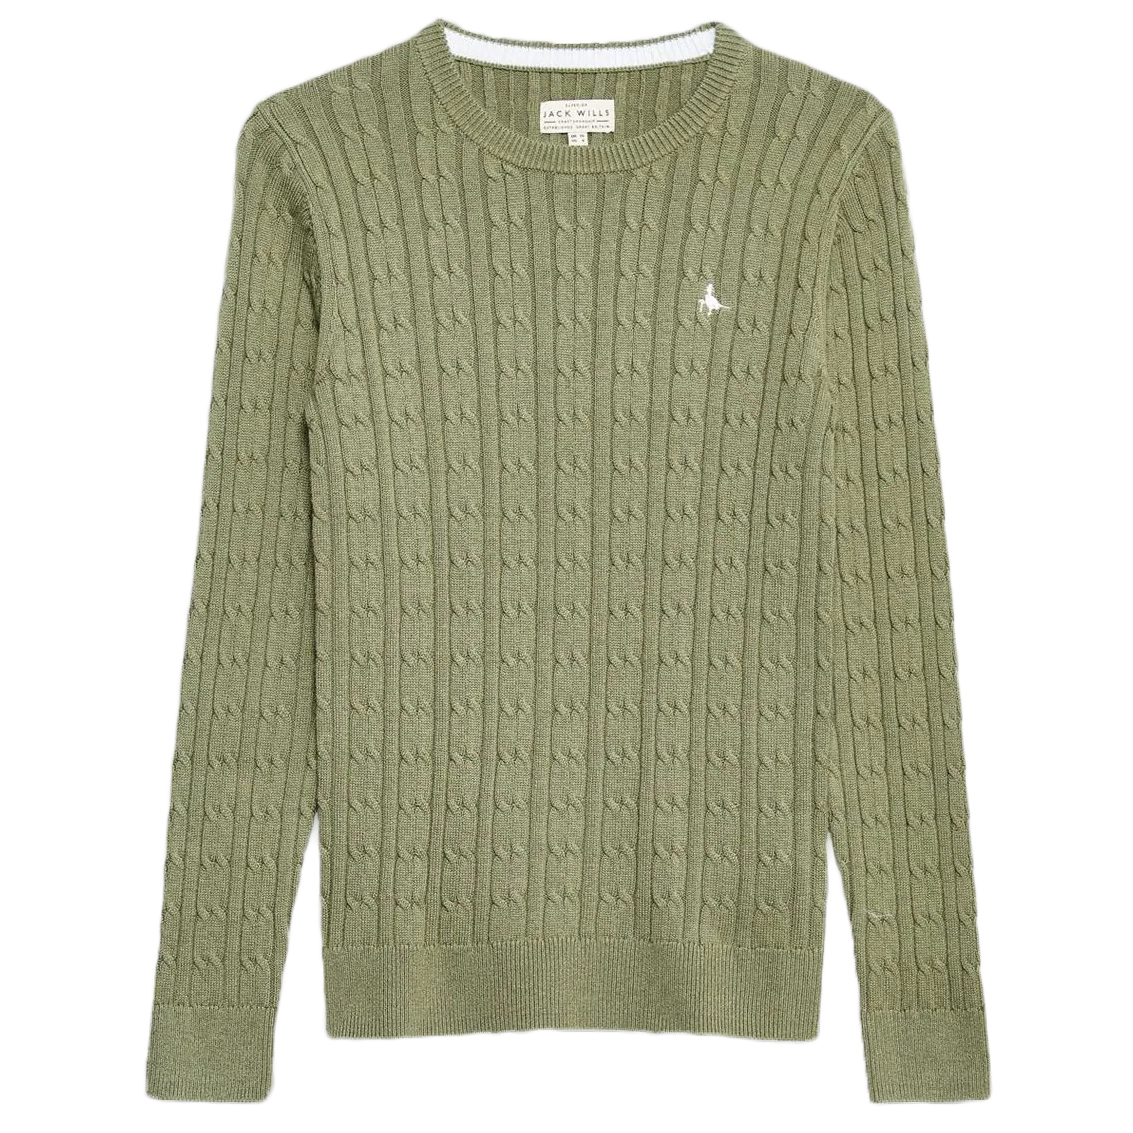 Jack Wills Tinsbury Classic Cable Crewneck Sweater - Green, 10